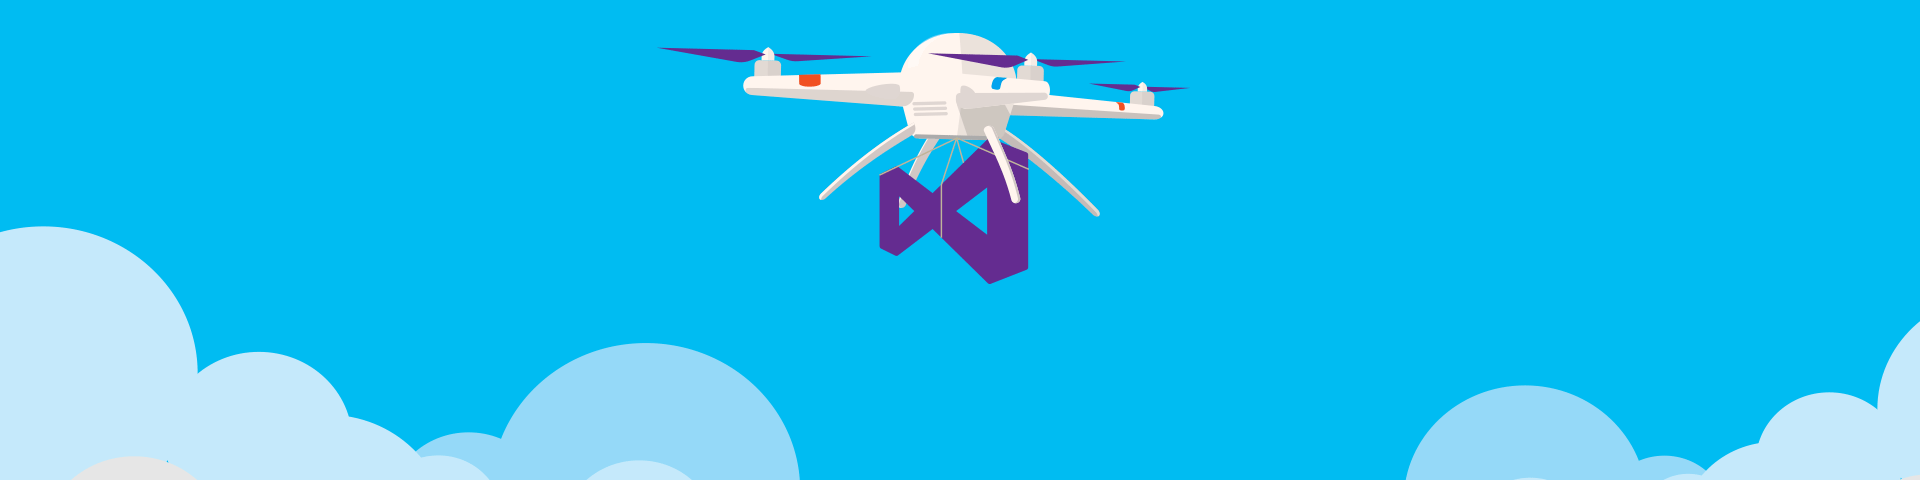 Visual Studio 로고를 운반하며 비행하고 있는 드론 일러스트레이션